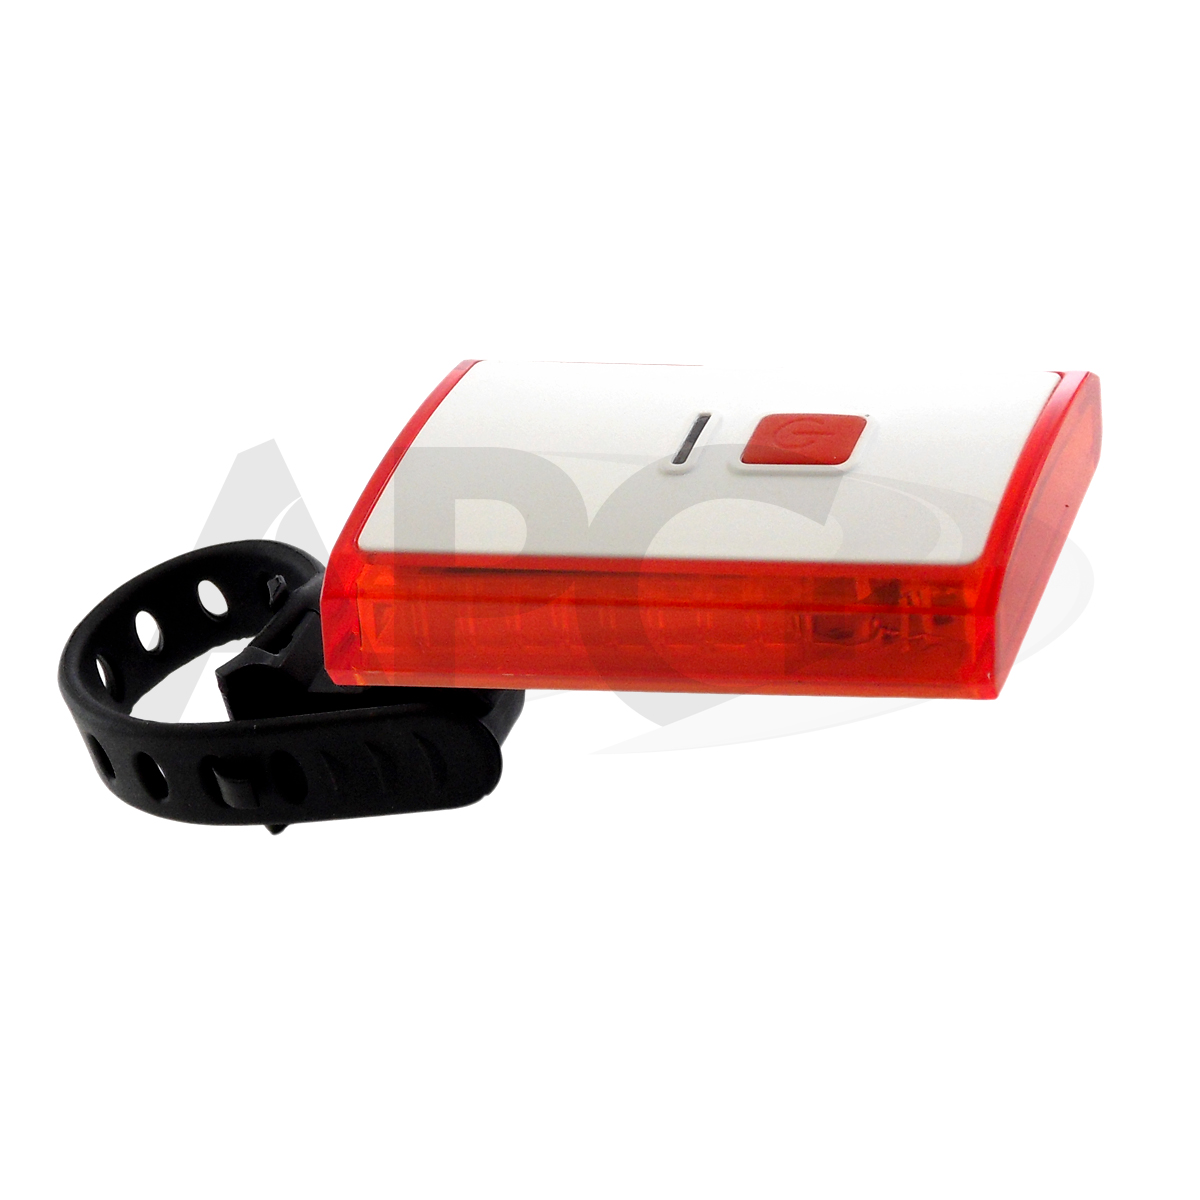 LAMPA TYŁ HW 161060 (XC-142 usb) biała